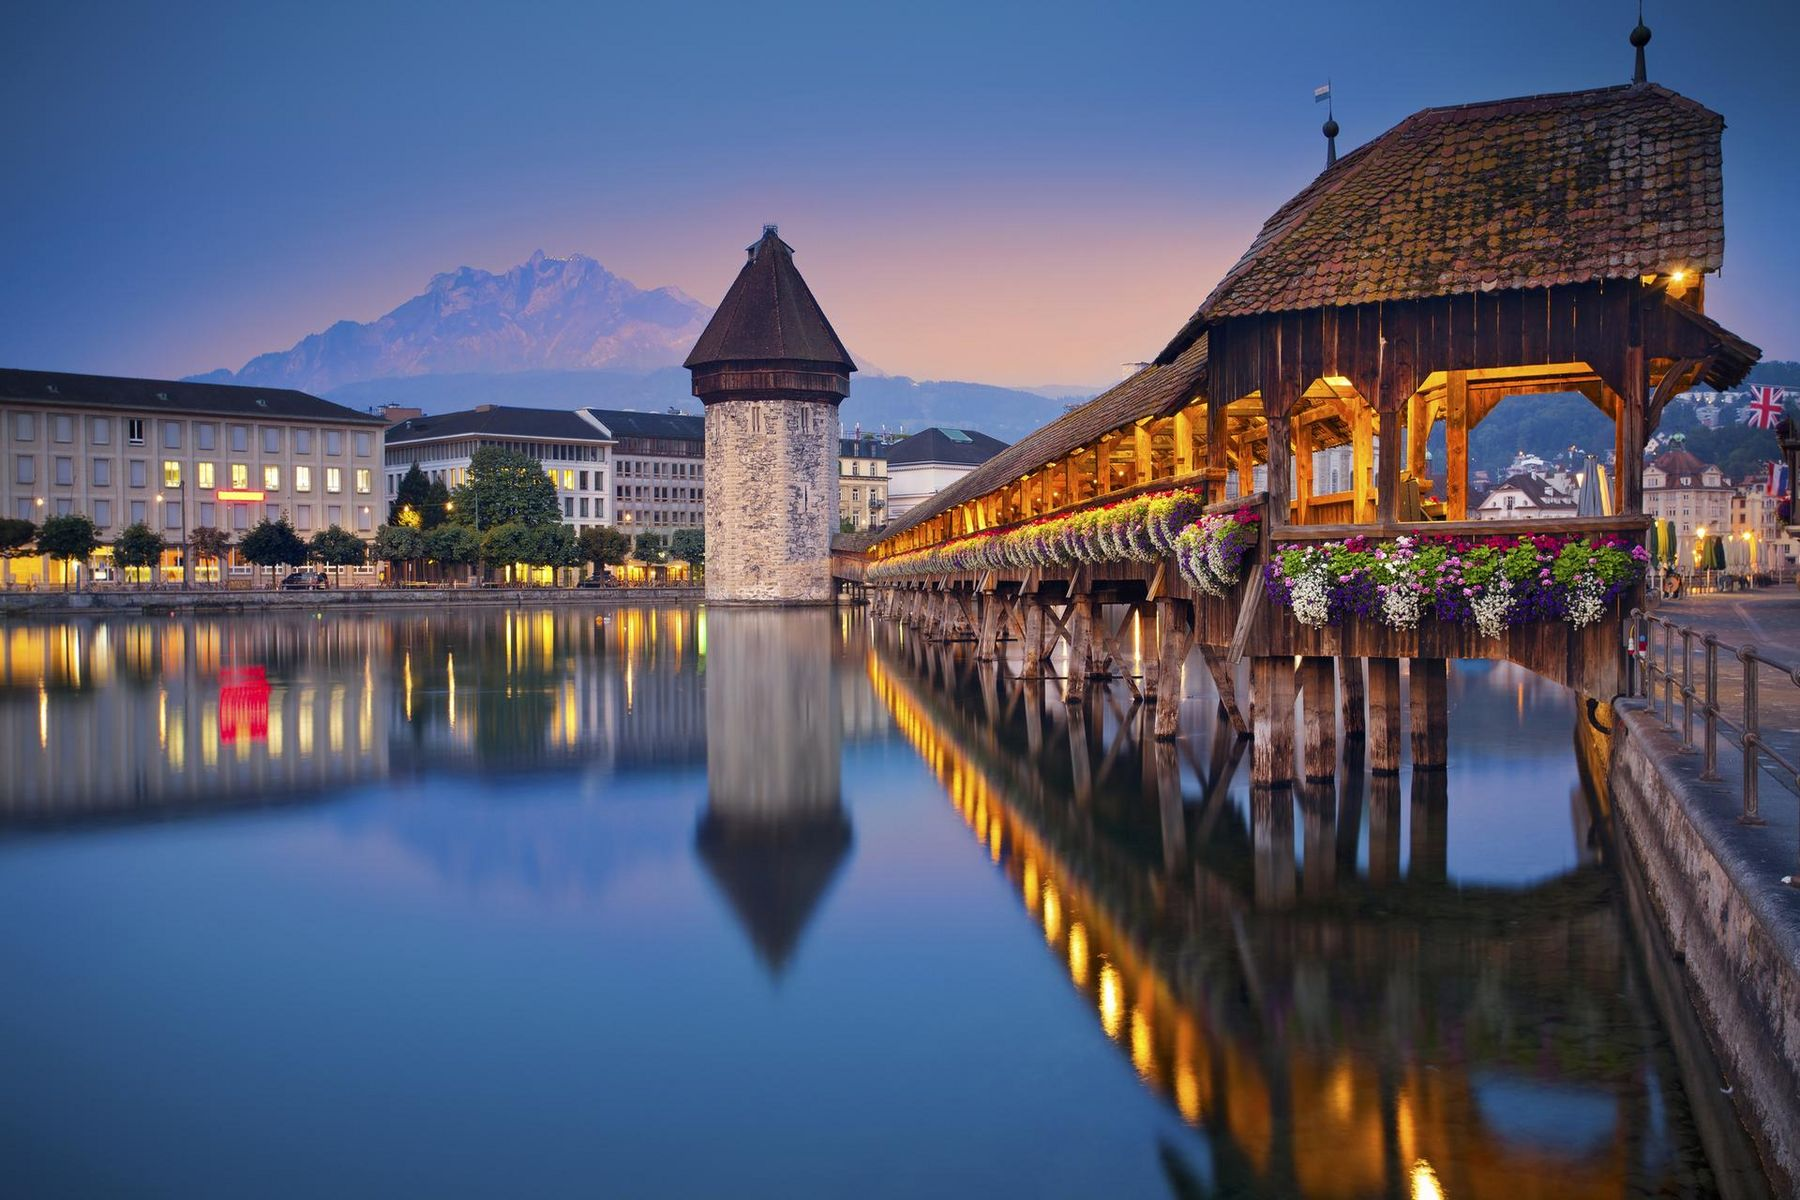 Luzern iStock 484770618